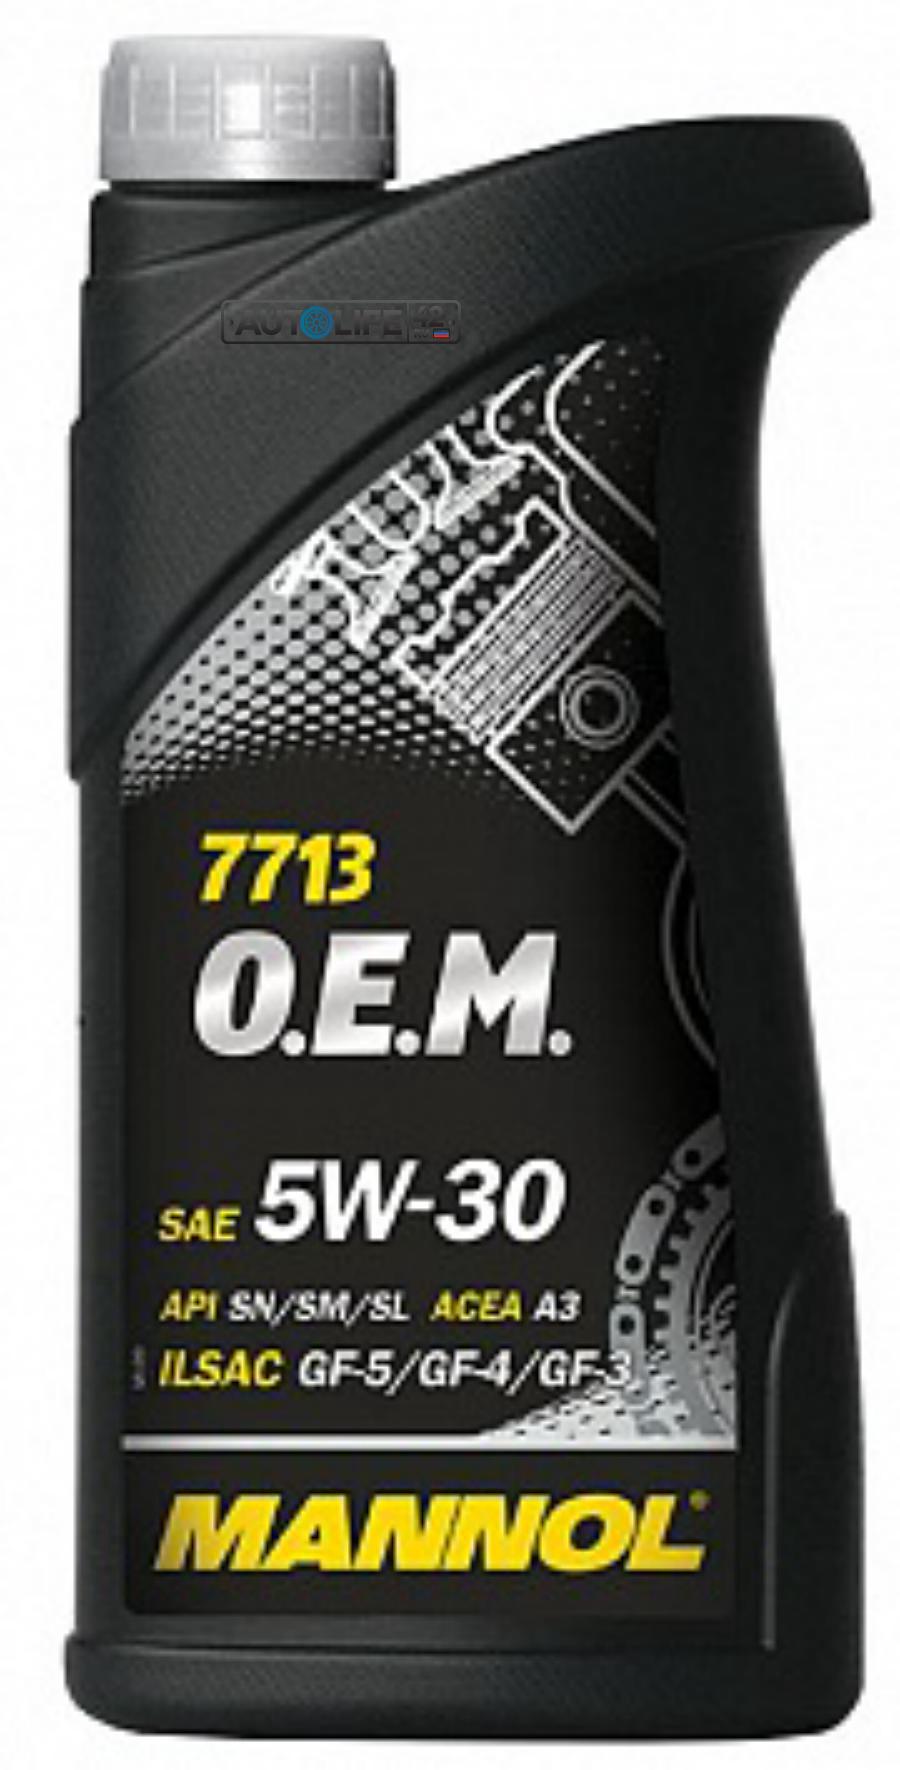 Масло моторное синтетическое 7713 O,E,M, for Hyundai Kia 5W-30, 1л